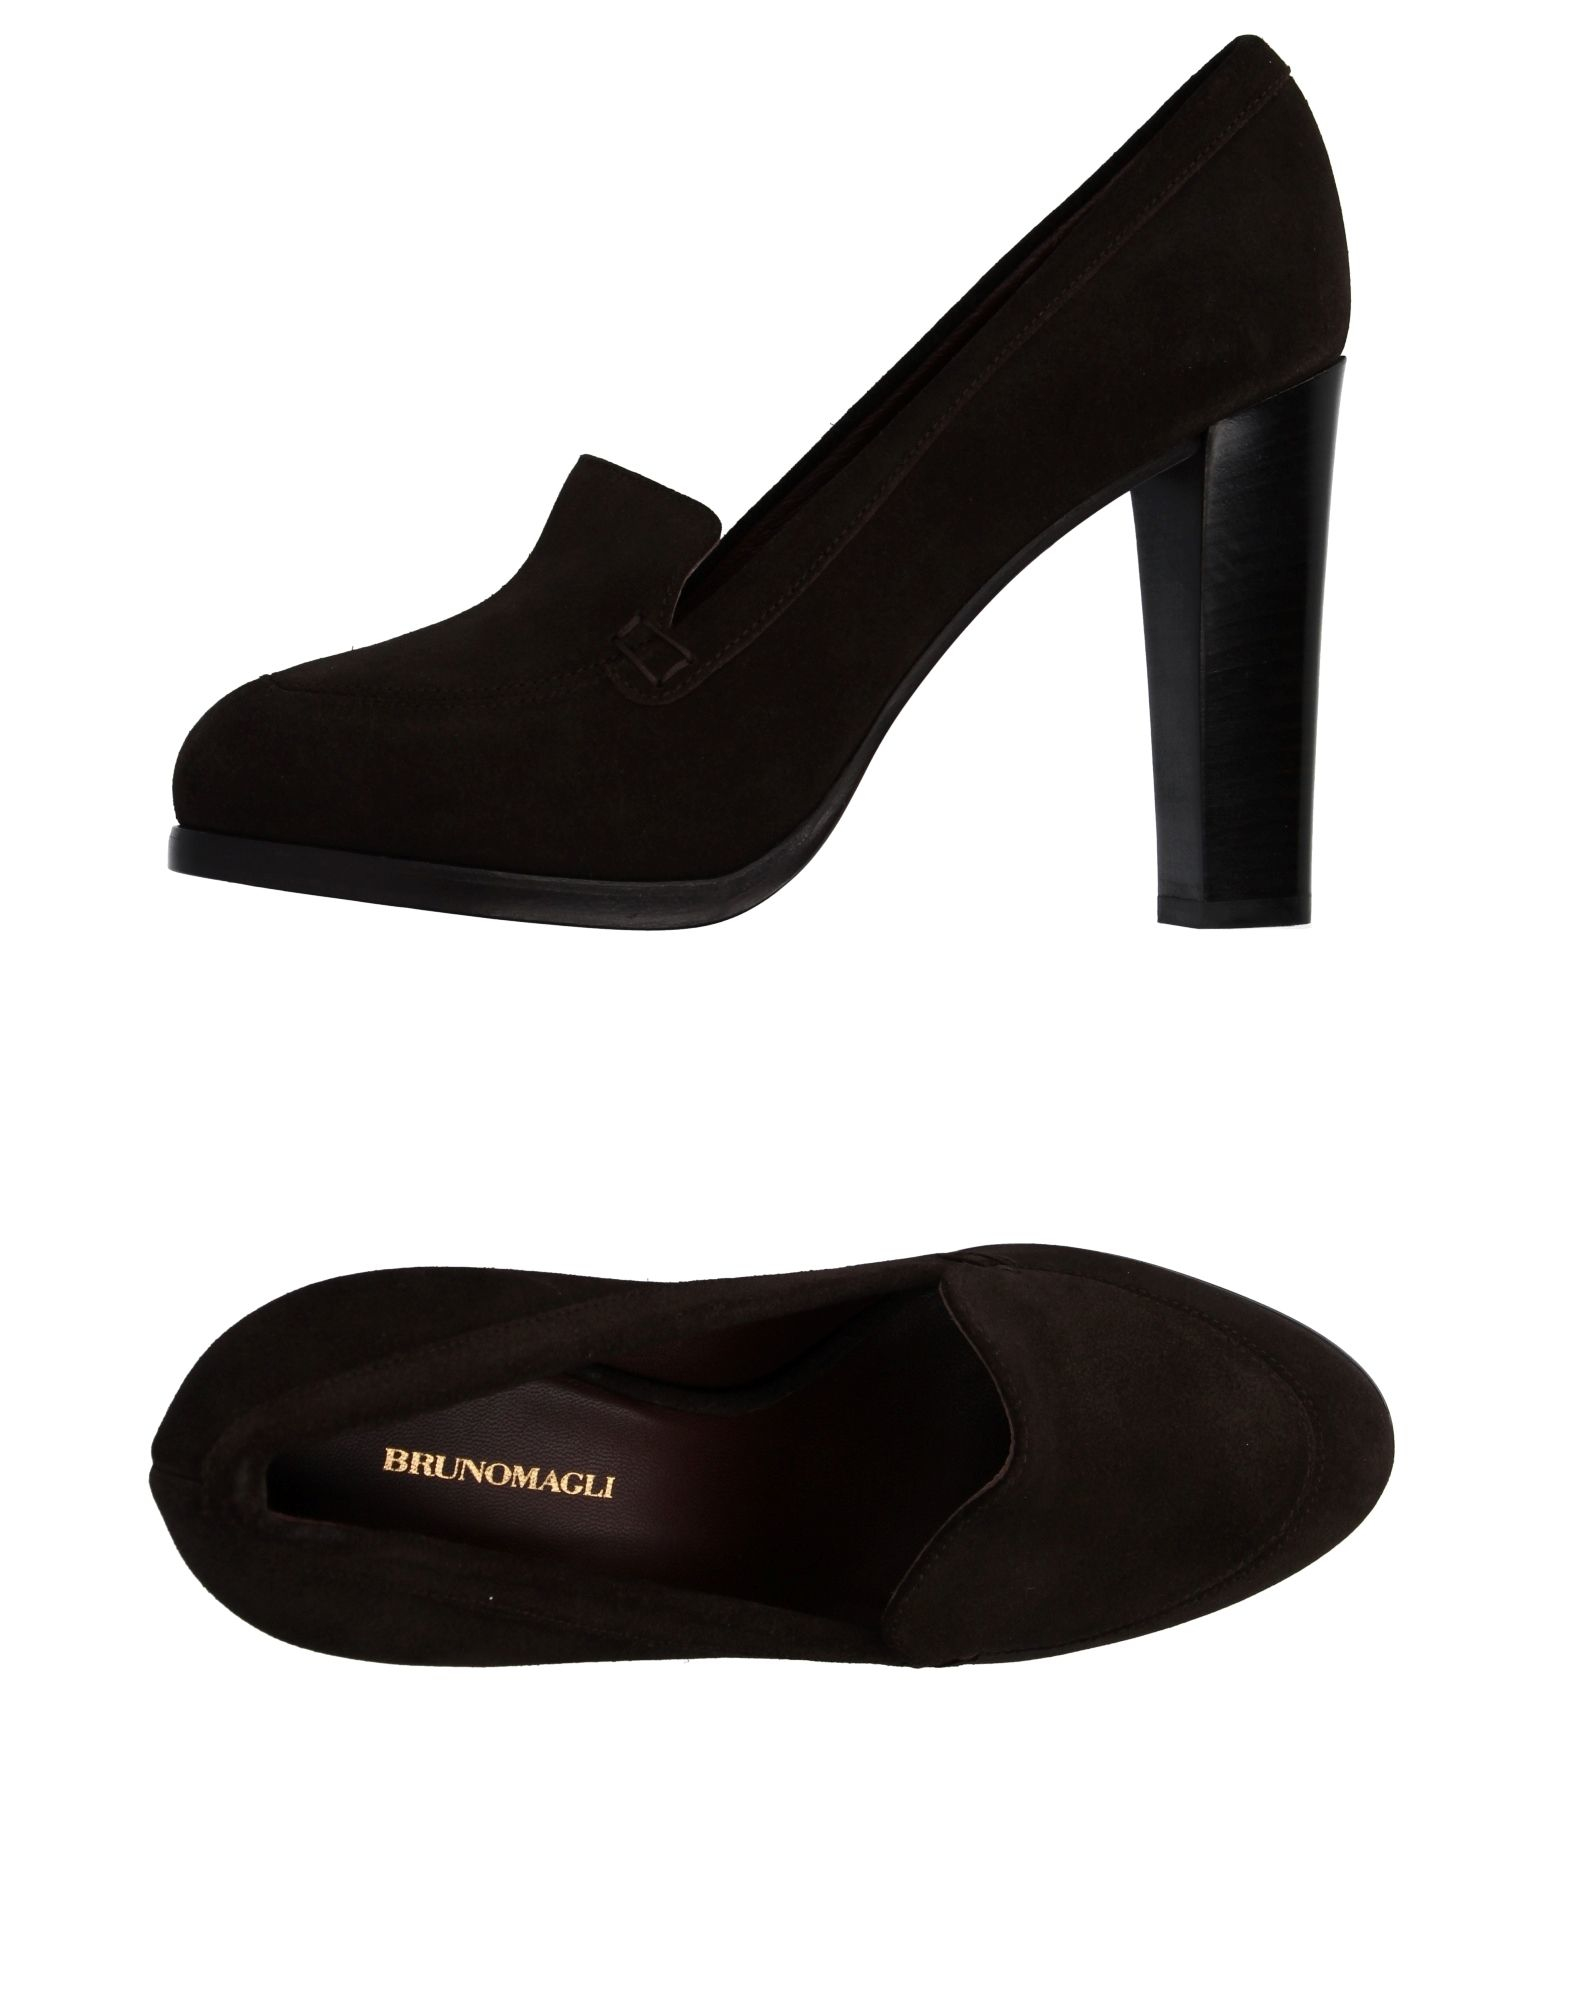 Magli Shoes Womens